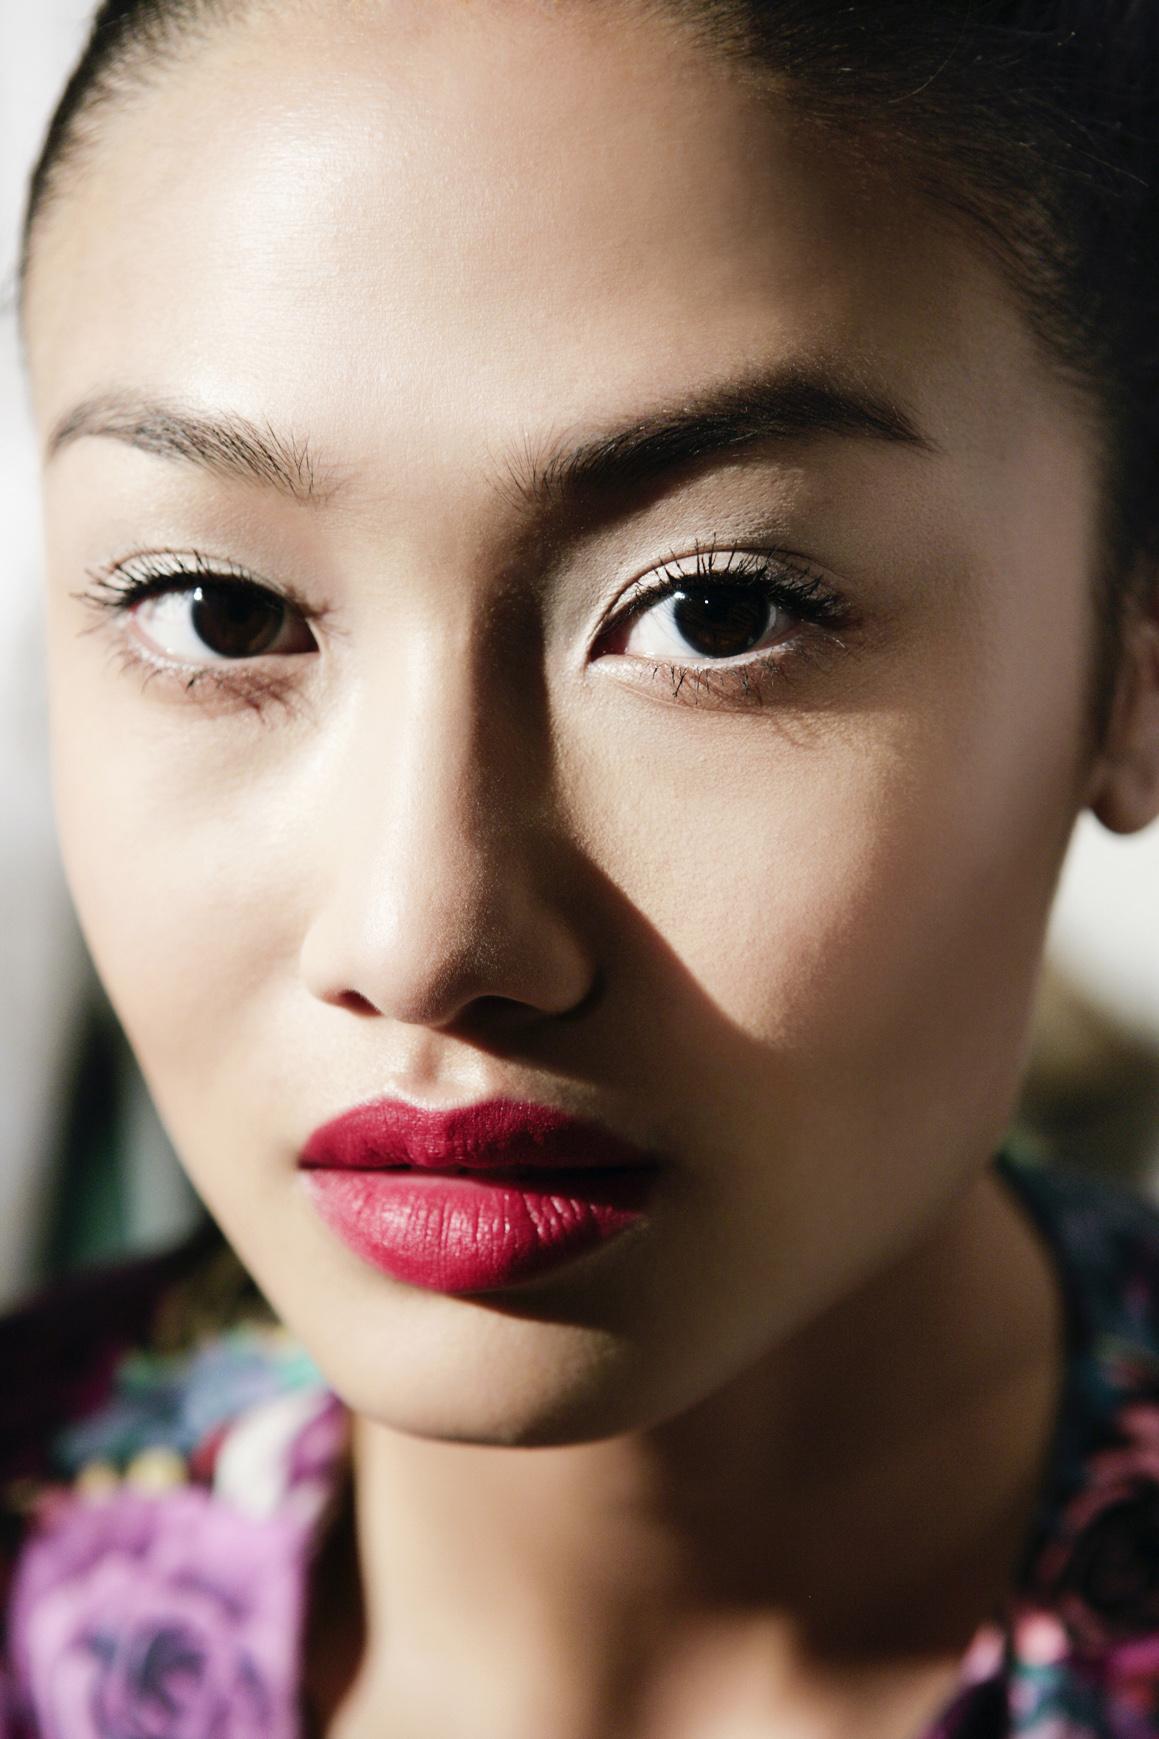 girl wearing hot pink lipstick